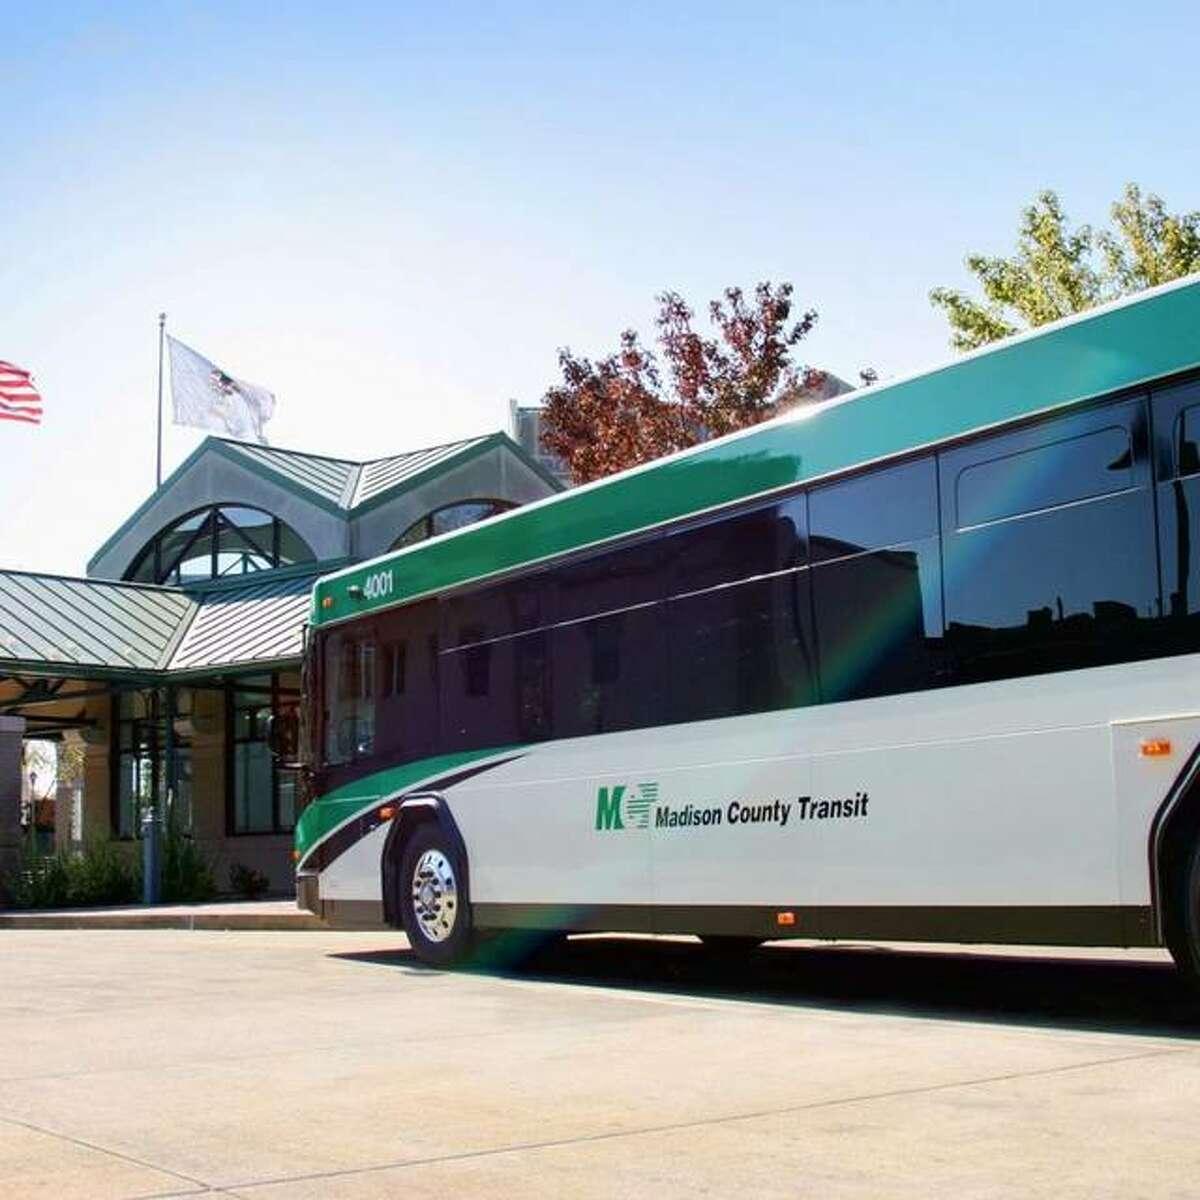 Madison County Transit's Muny Express resumes service on Friday, July 30.